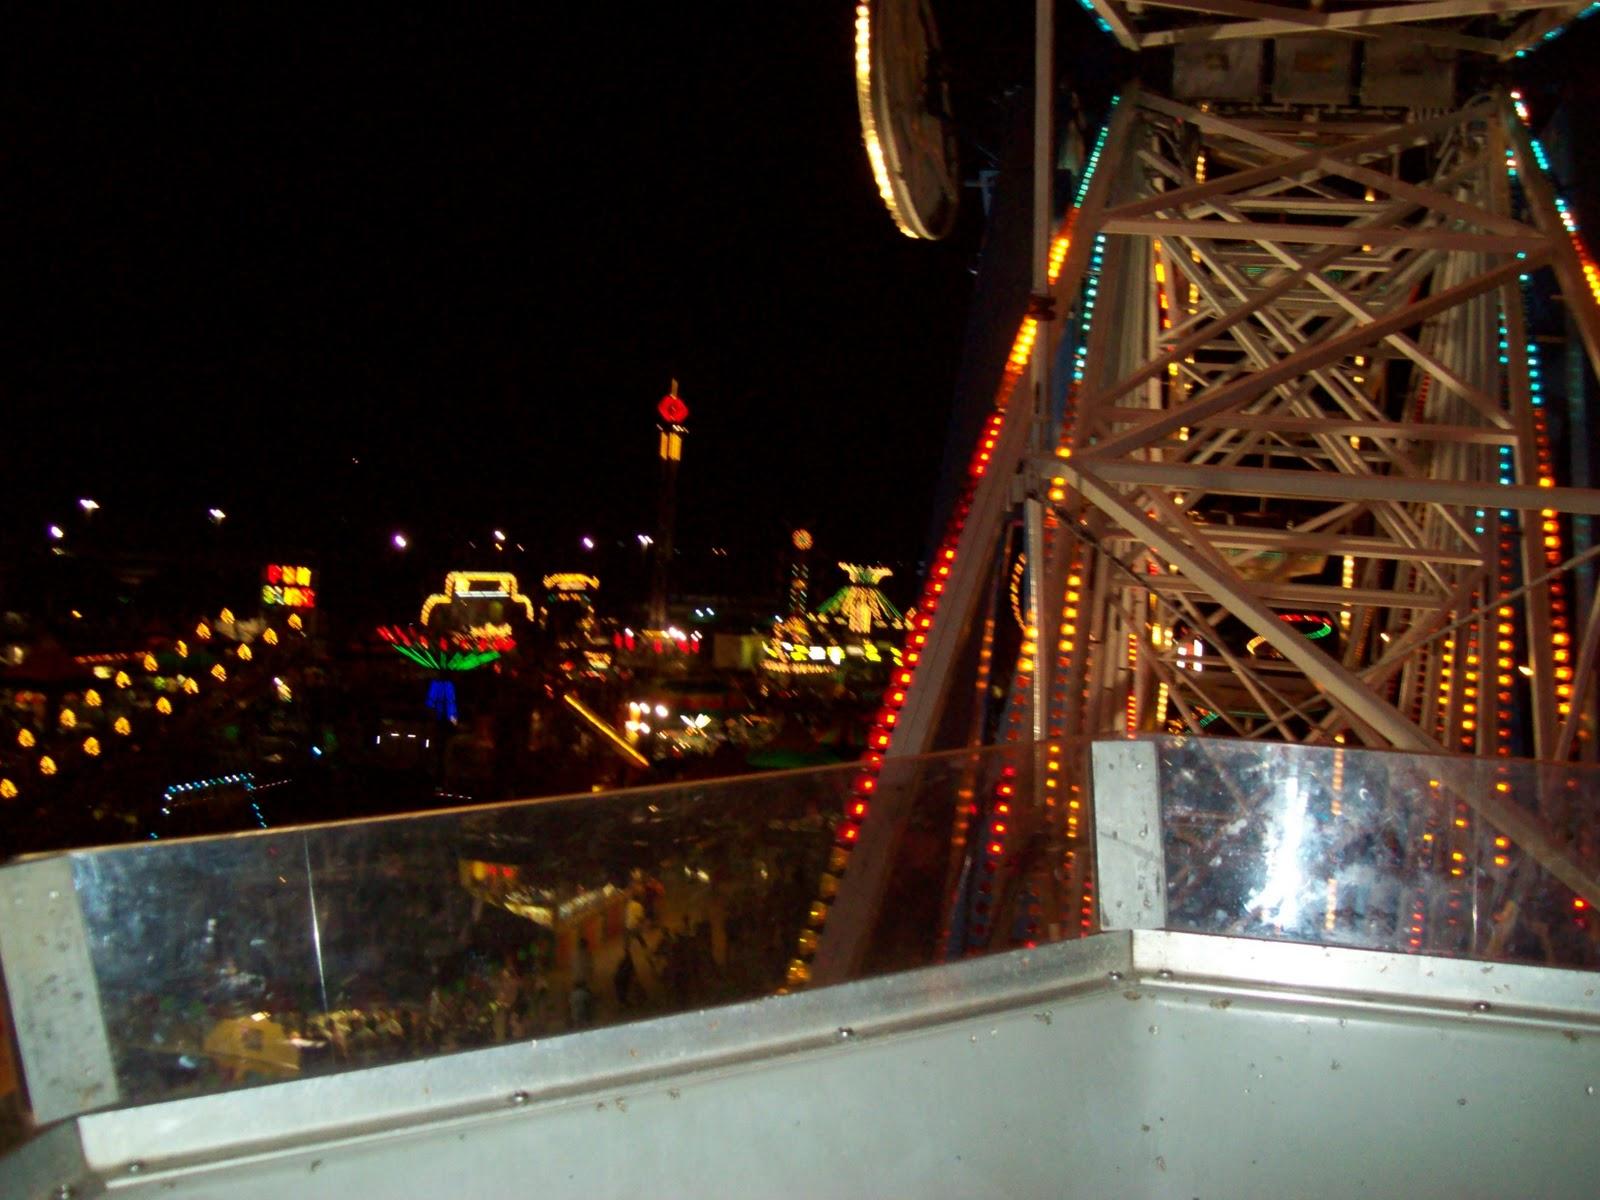 Fort Bend County Fair - 101_5445.JPG